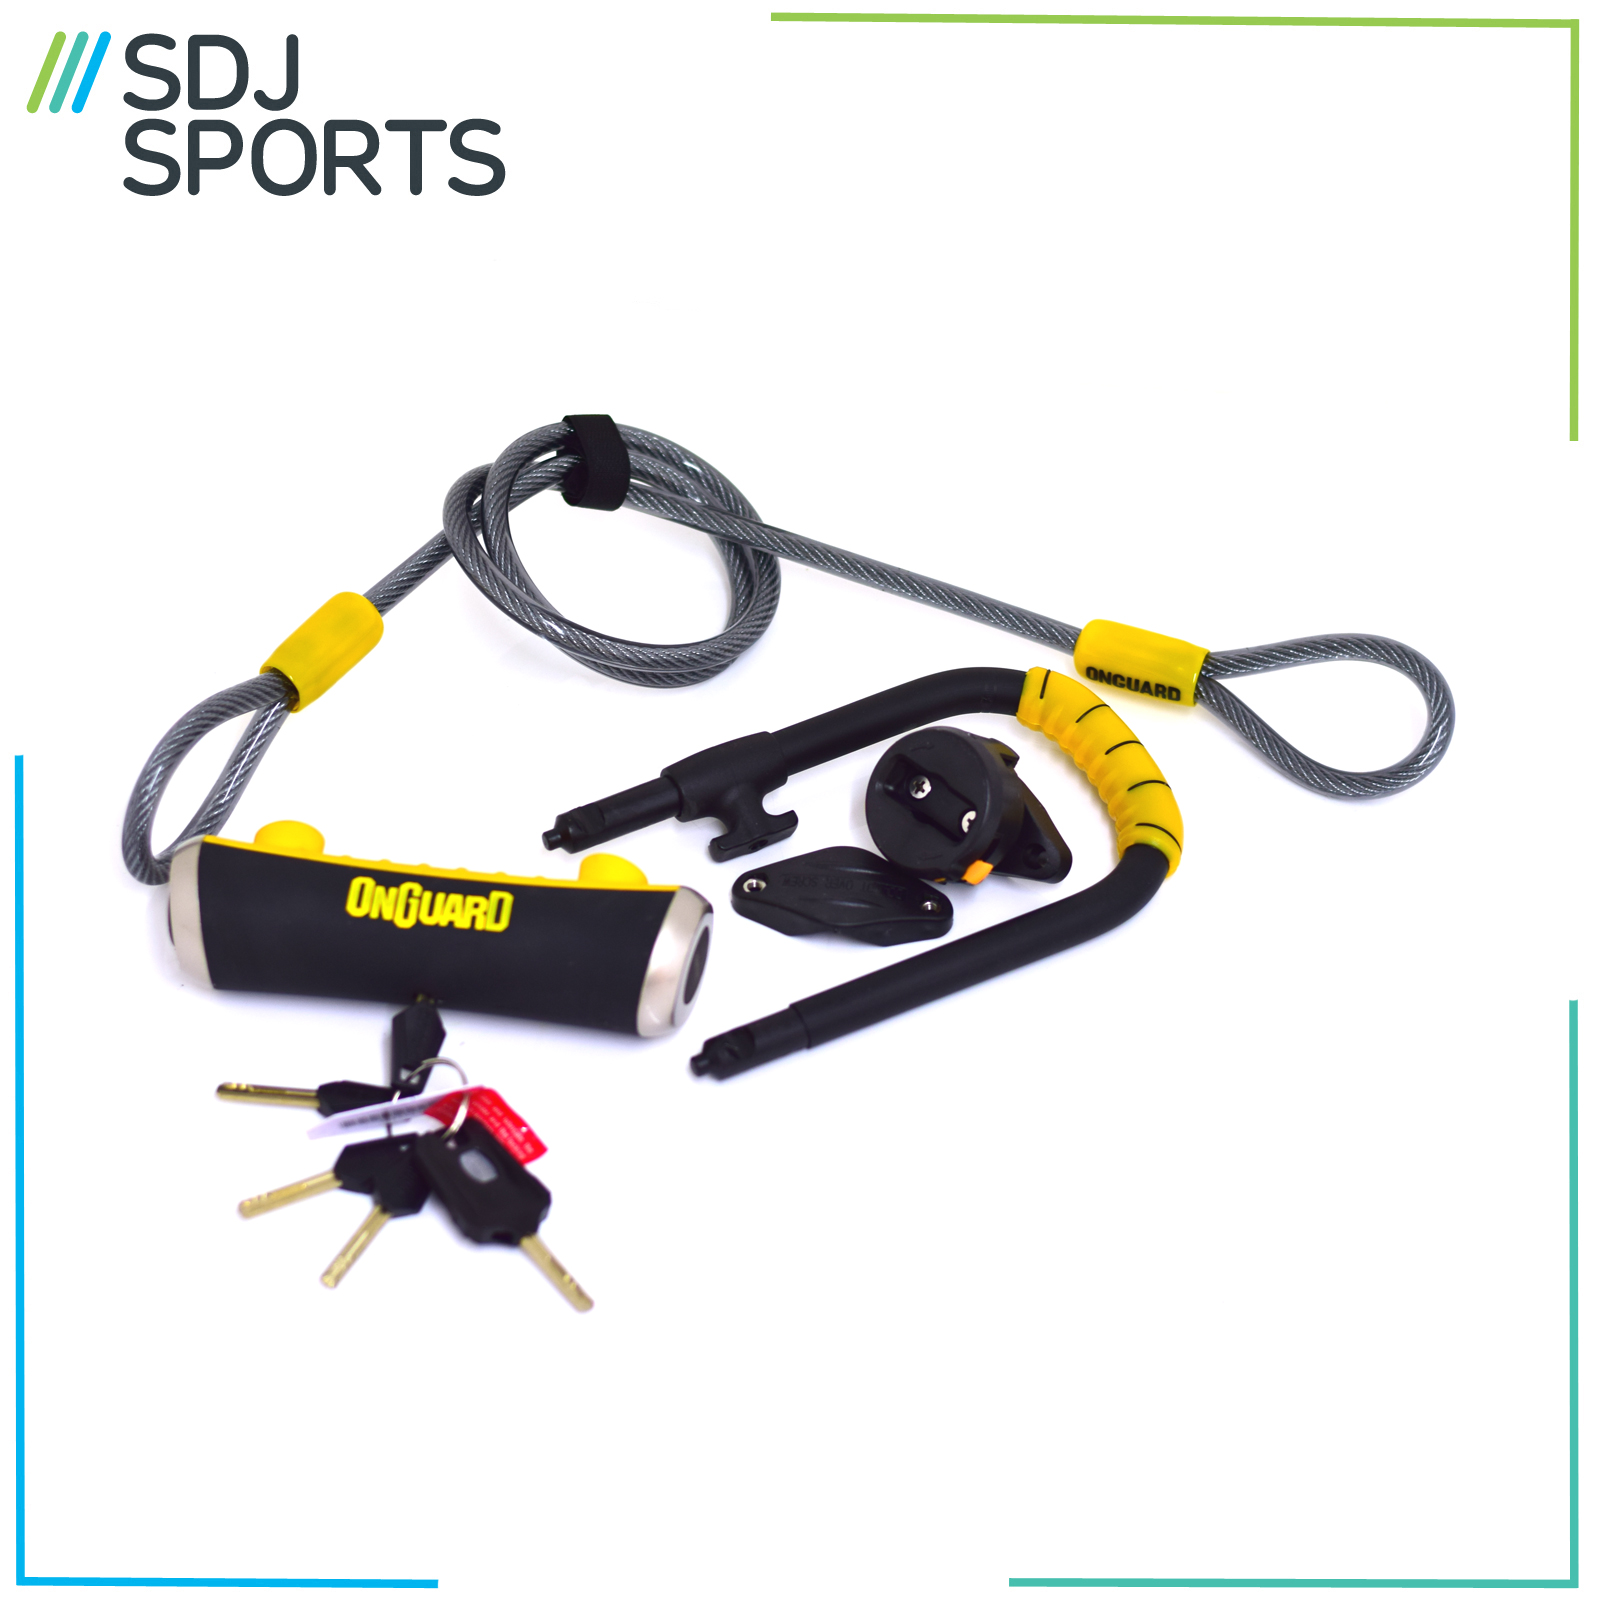 magnum onguard pitbull mini dt 8008 shackle lock cable bike d u lock ebay. Black Bedroom Furniture Sets. Home Design Ideas